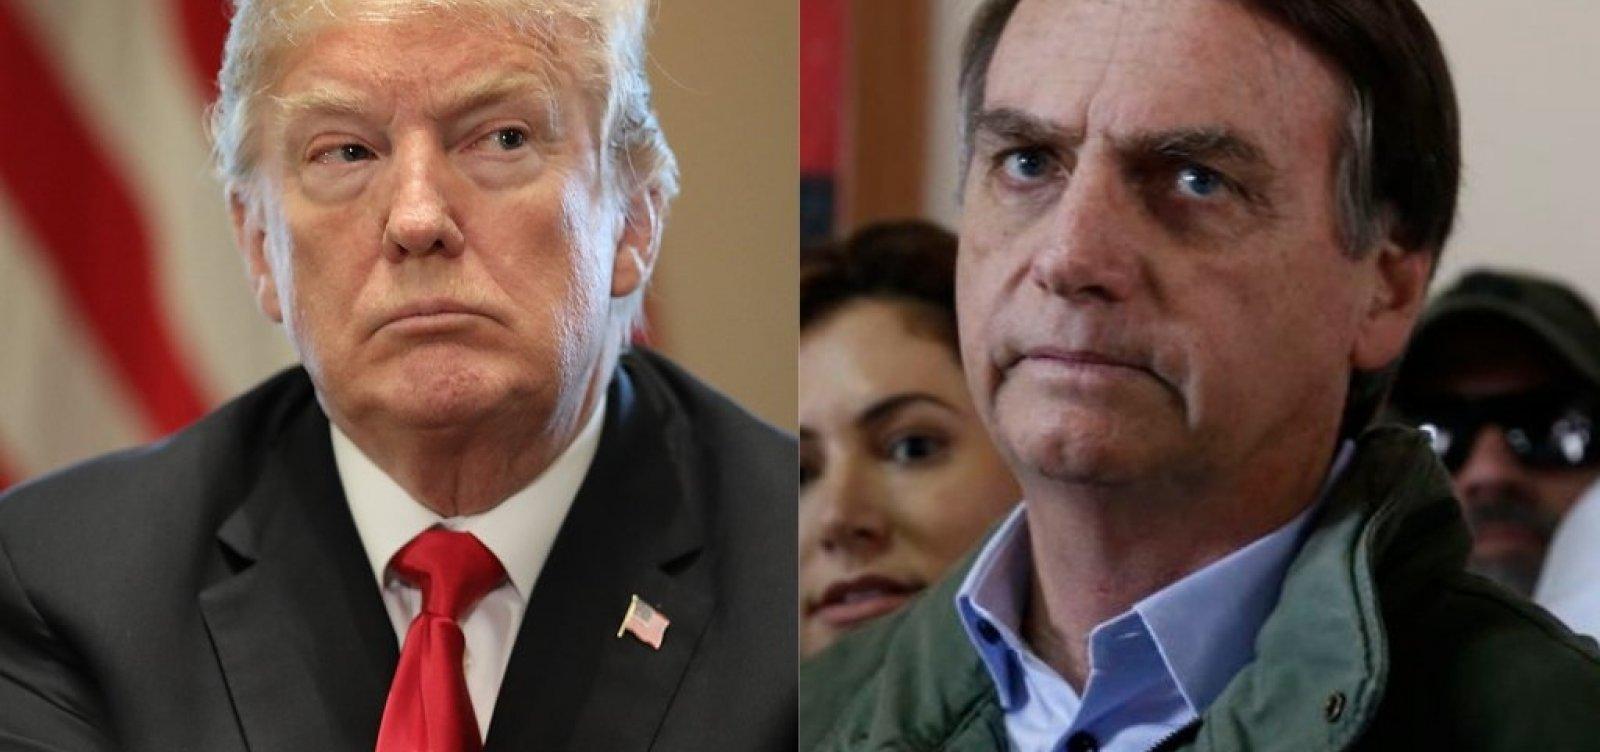 [Trump parabeniza Bolsonaro por vitória]